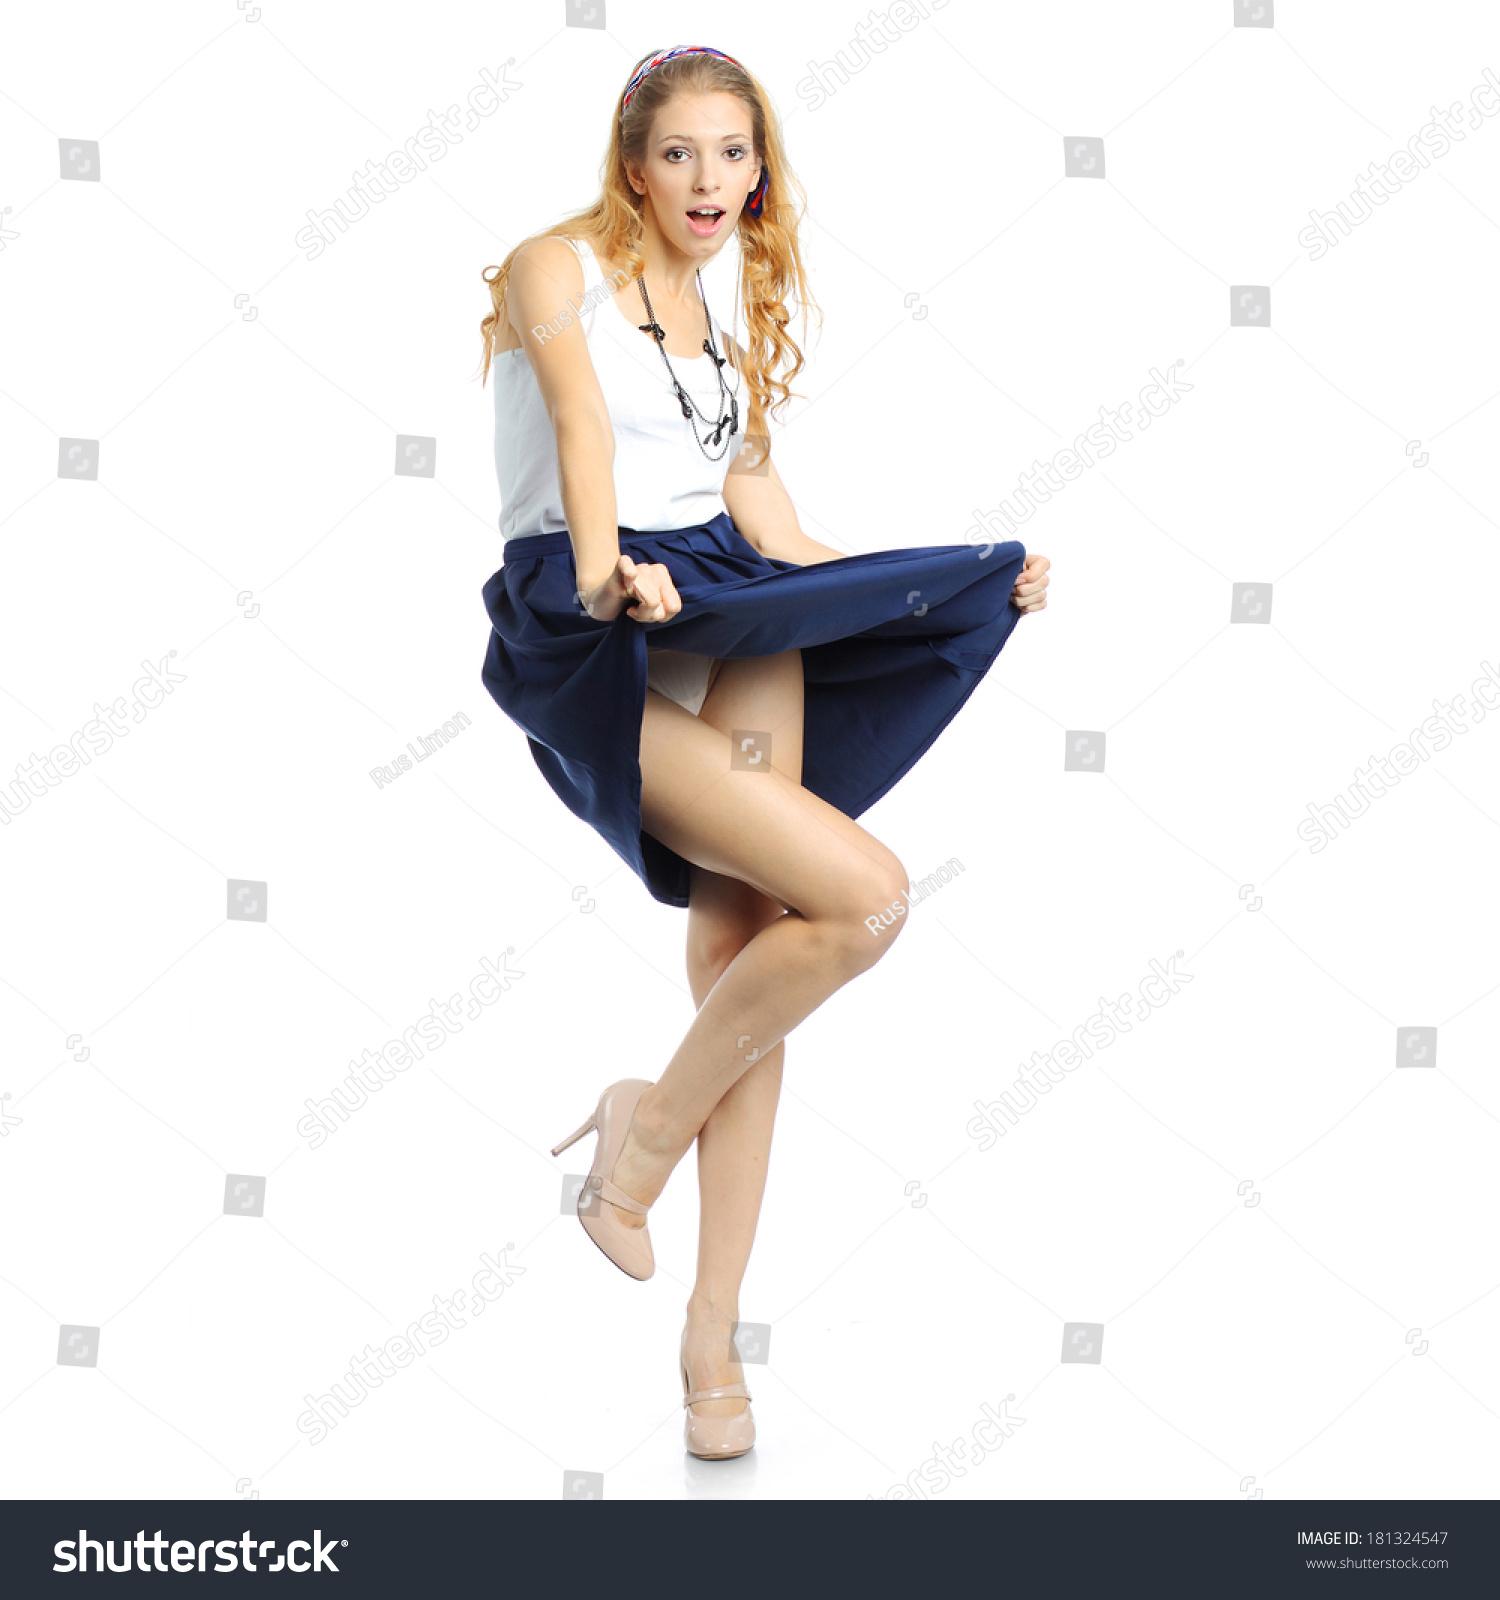 Ladies lifting their skirts